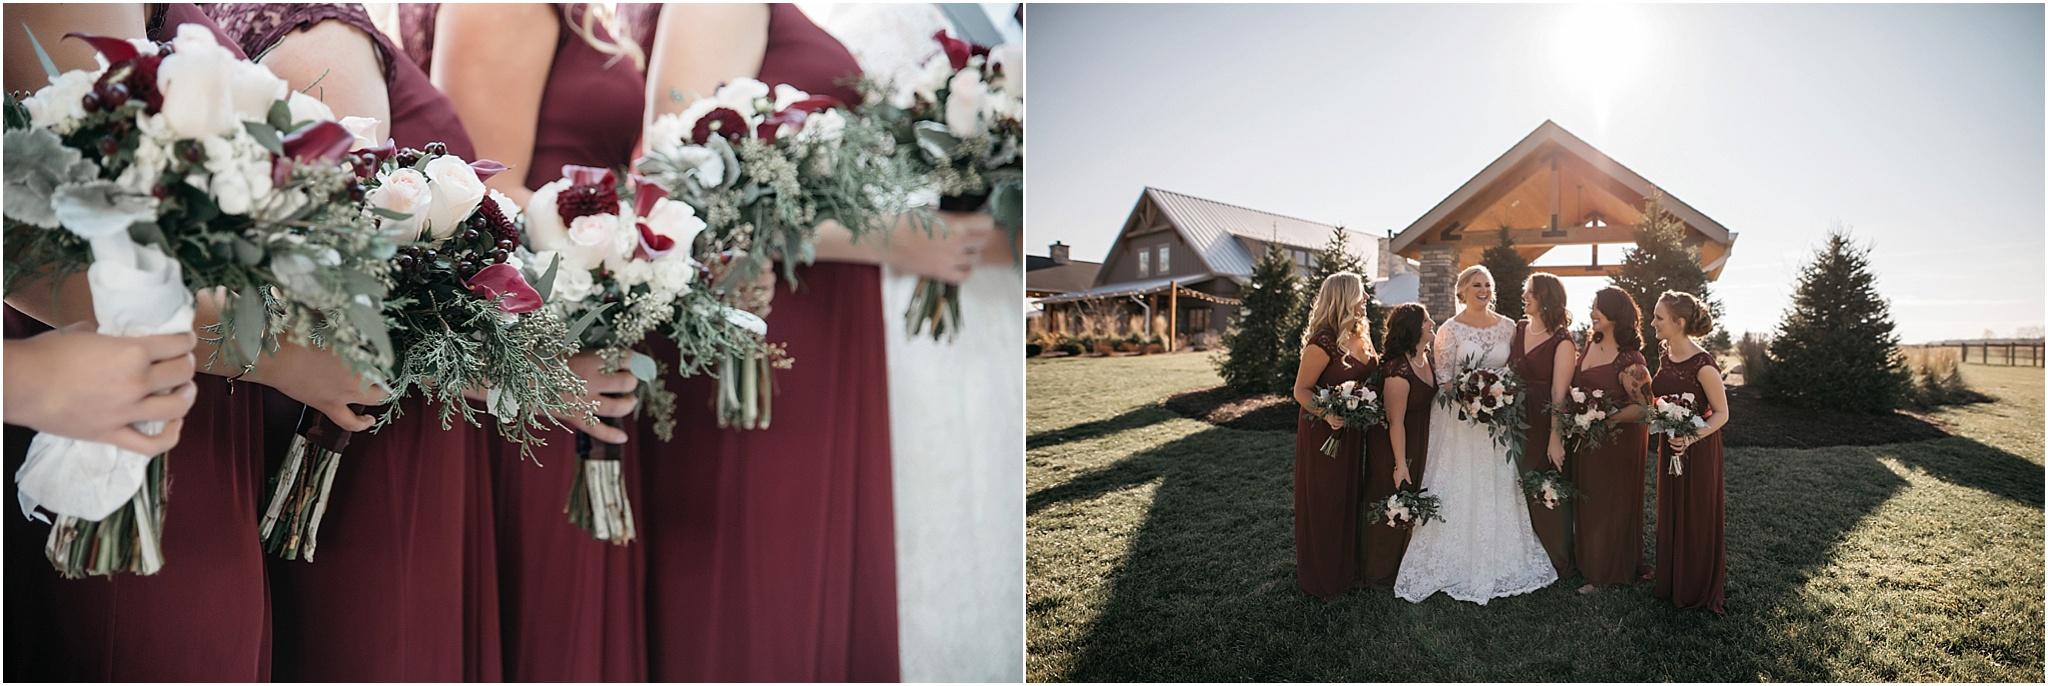 Indianapolis-Wedding-Photographer_0694.jpg